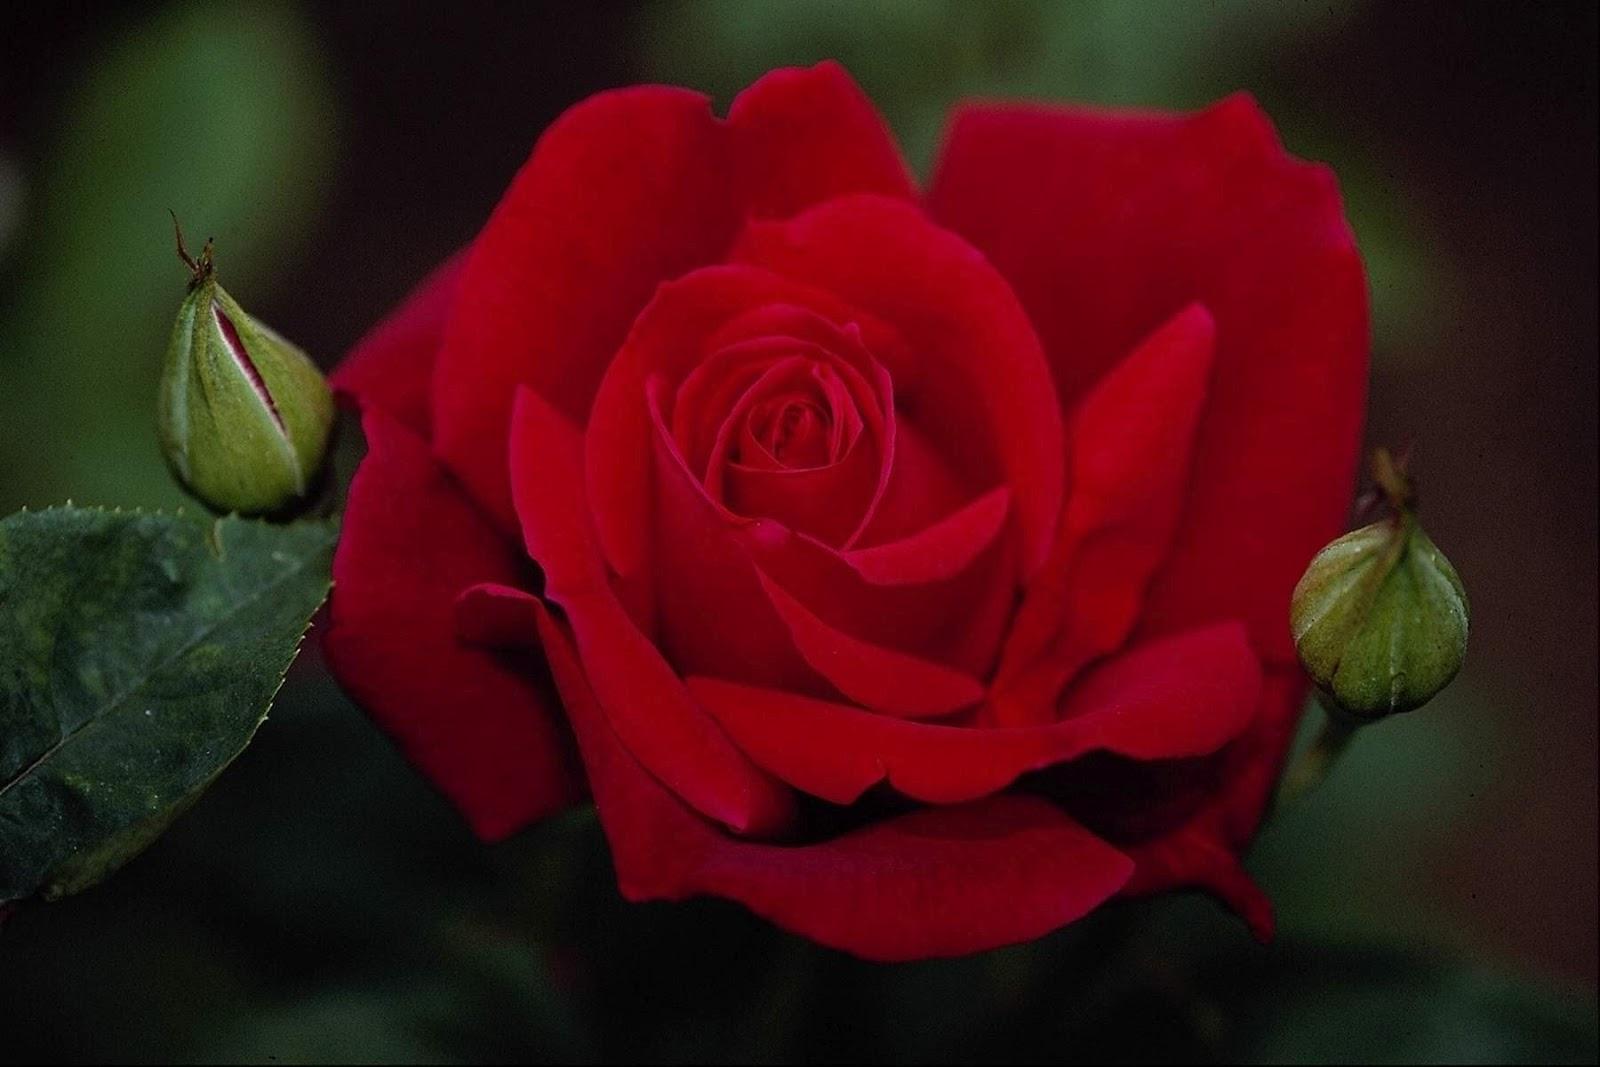 50 most beautiful rose flowers wallpapers on - Beautiful rose wallpaper ...